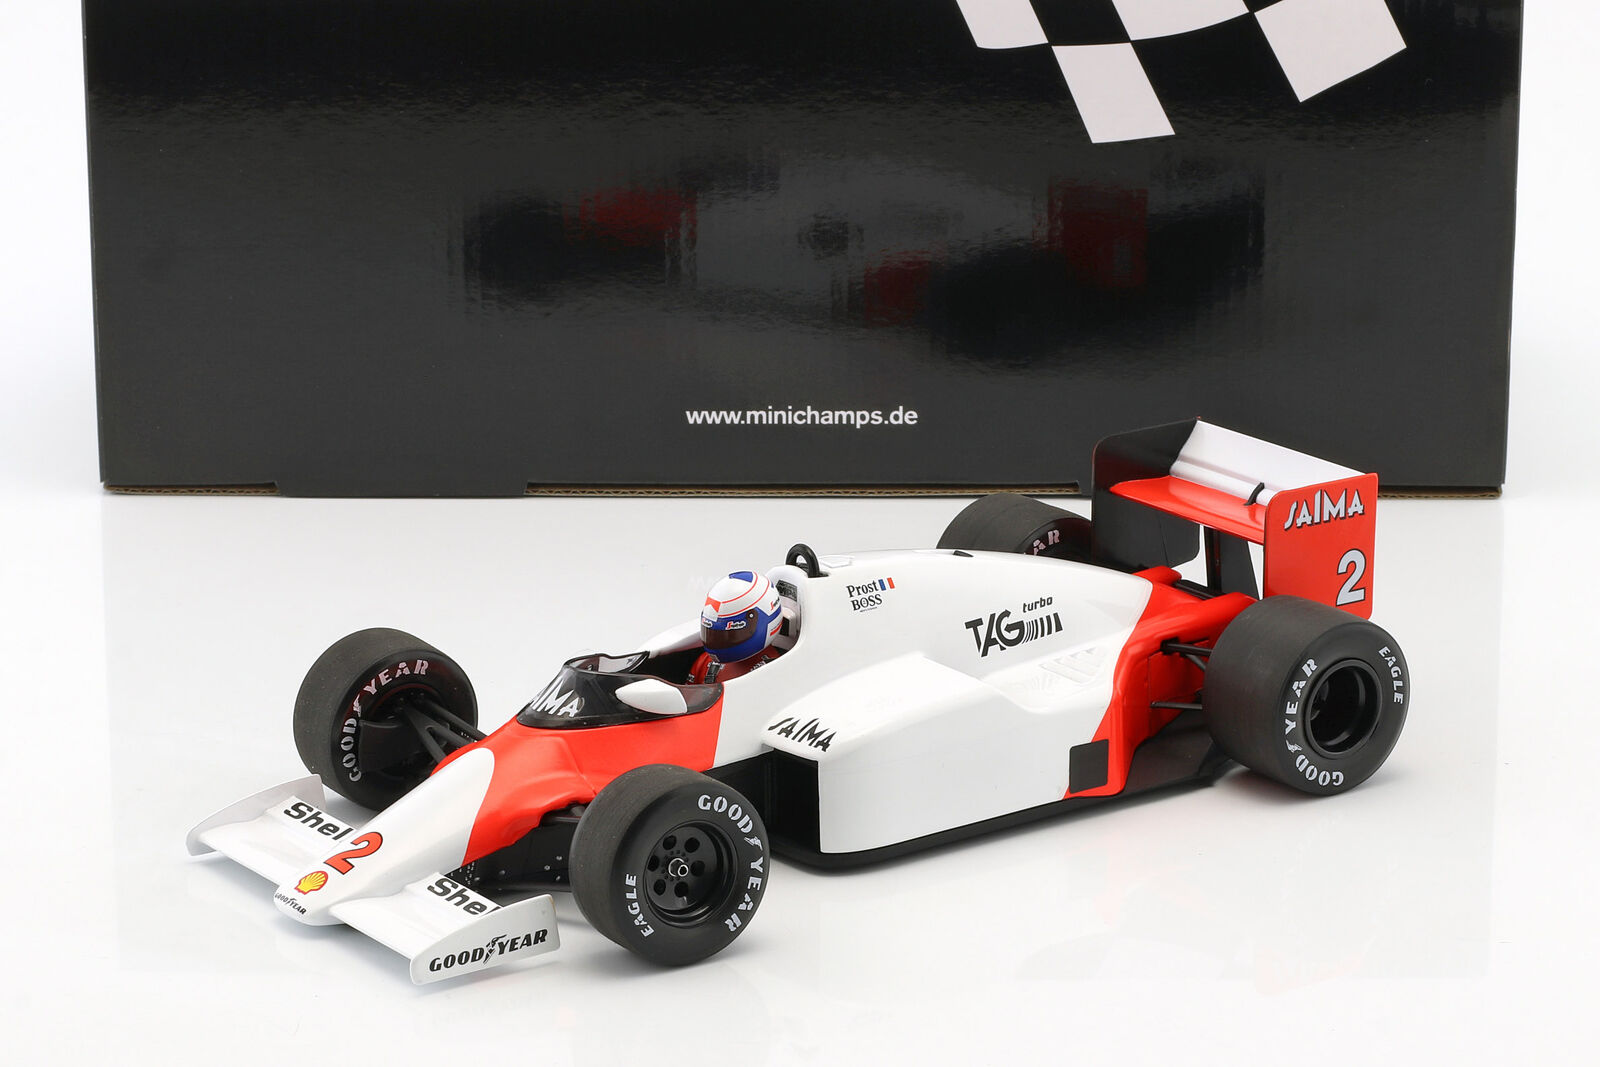 Alain Prost McLaren mp4 2b  2 2 2 World Champion Formule 1 1985 1 18 Minichamps 9dac67